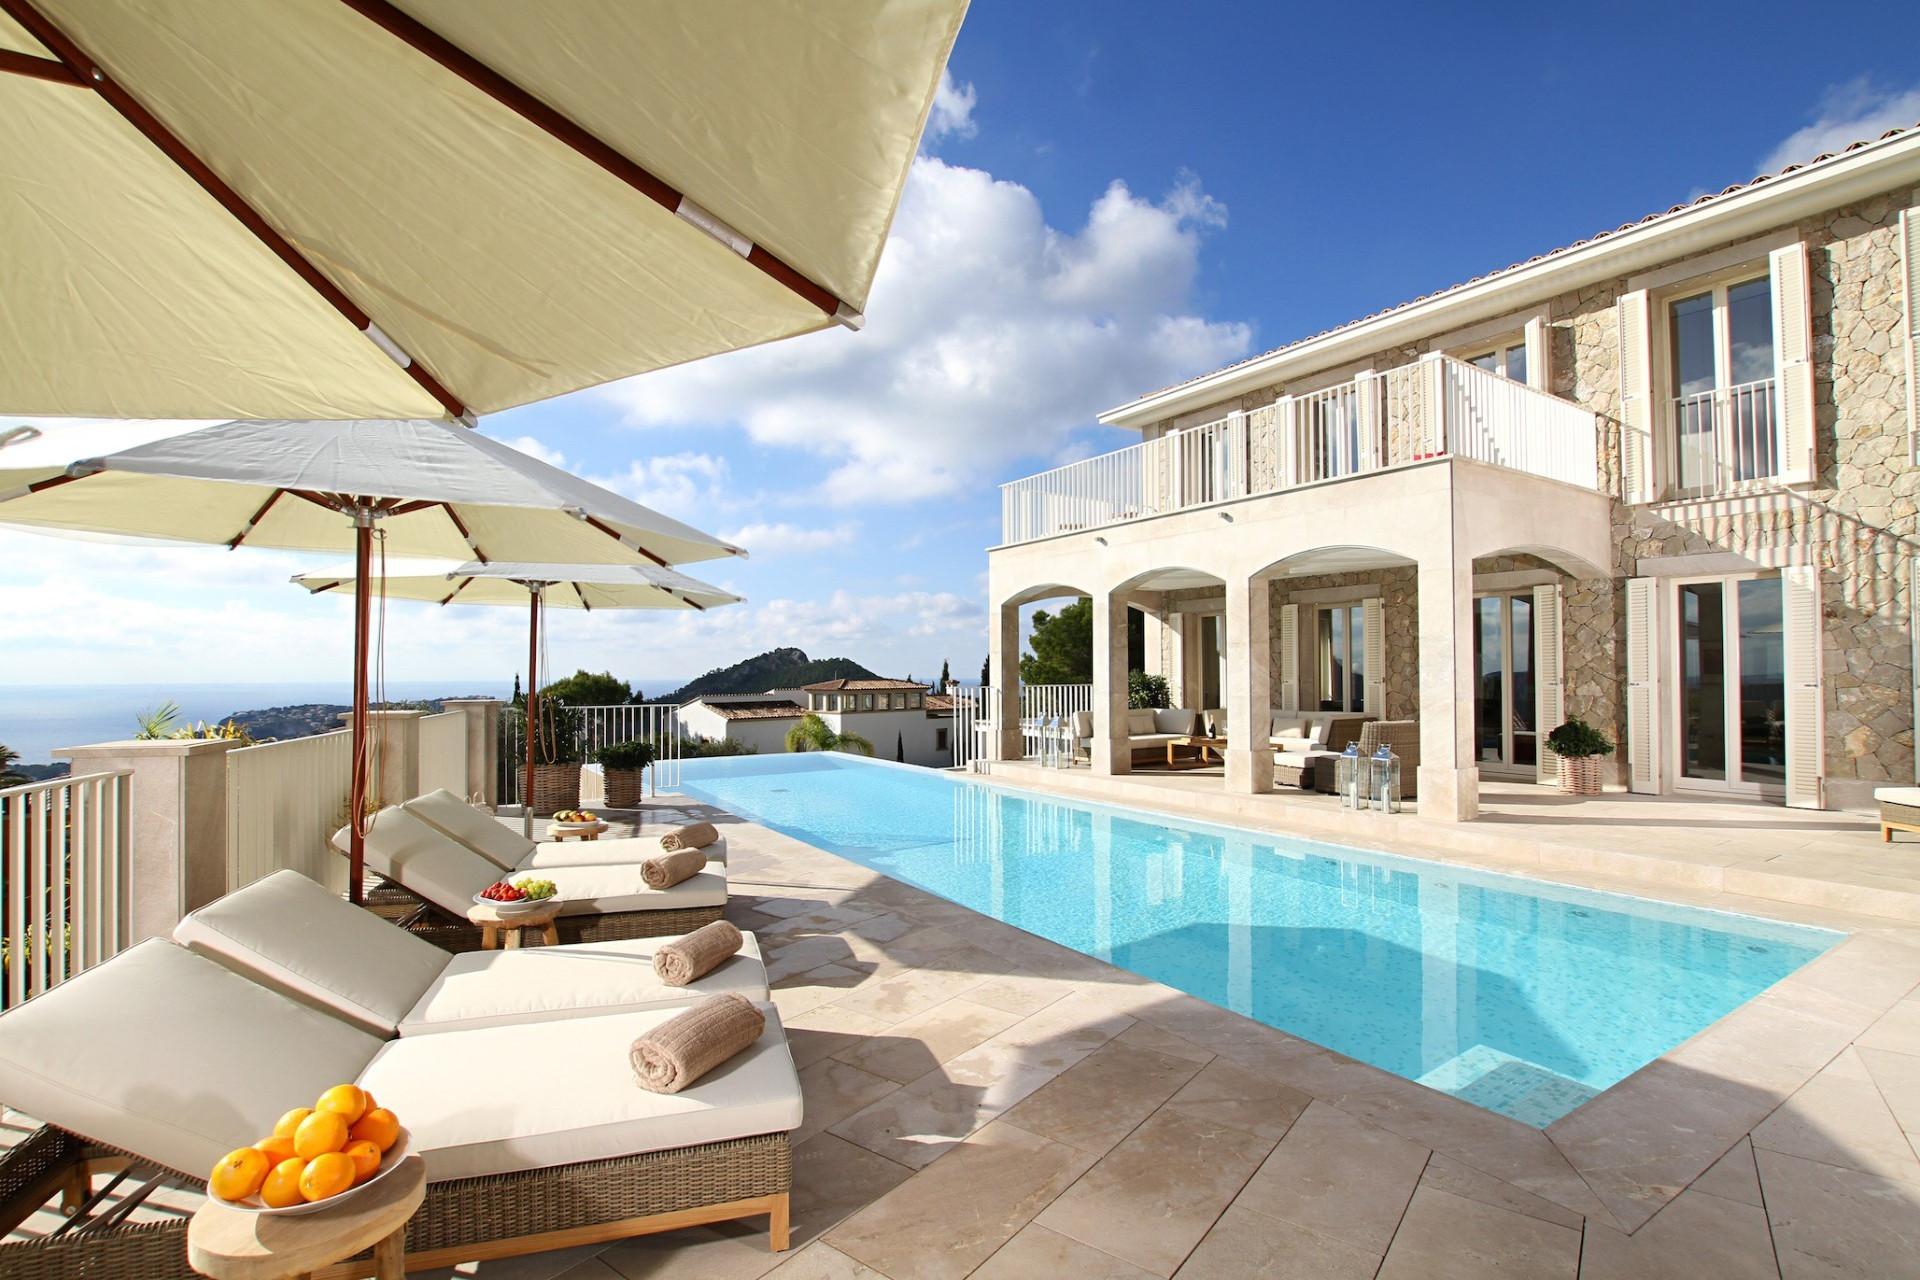 6 Bedroom Villa Andratx Luxury Villa With Infinity Pool &  Games Room